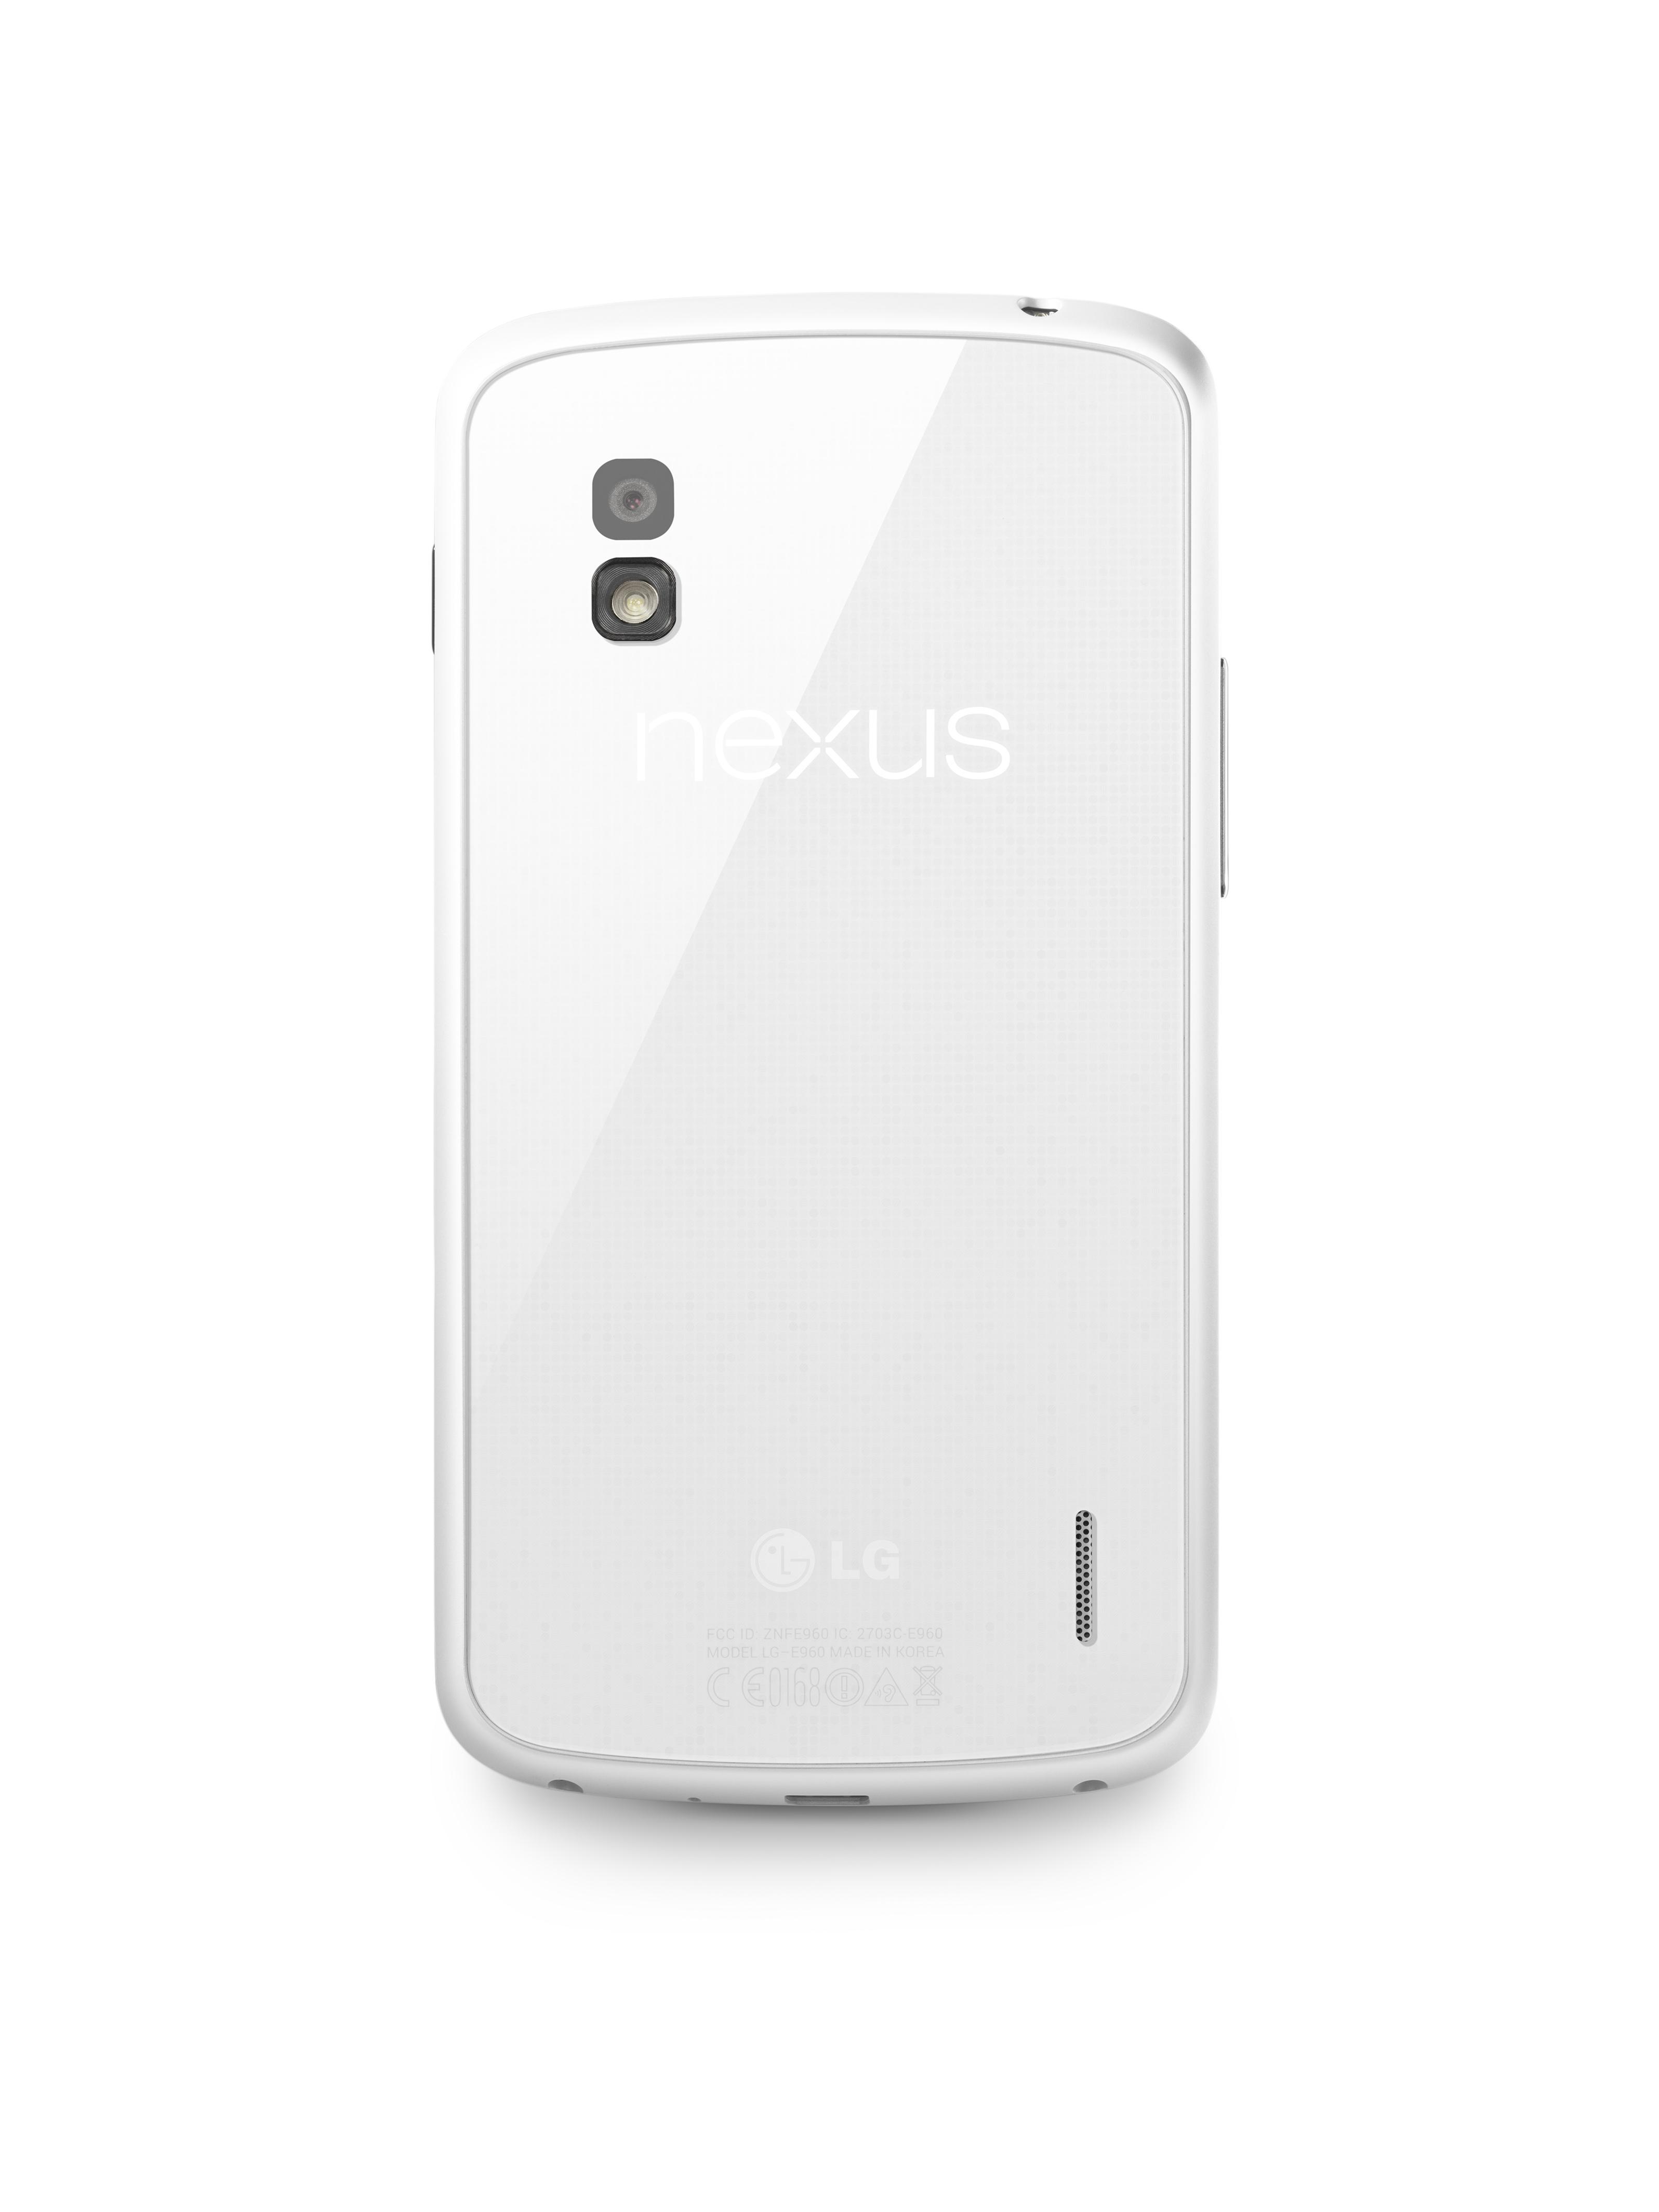 LG_NEXUS4_WHITE-03